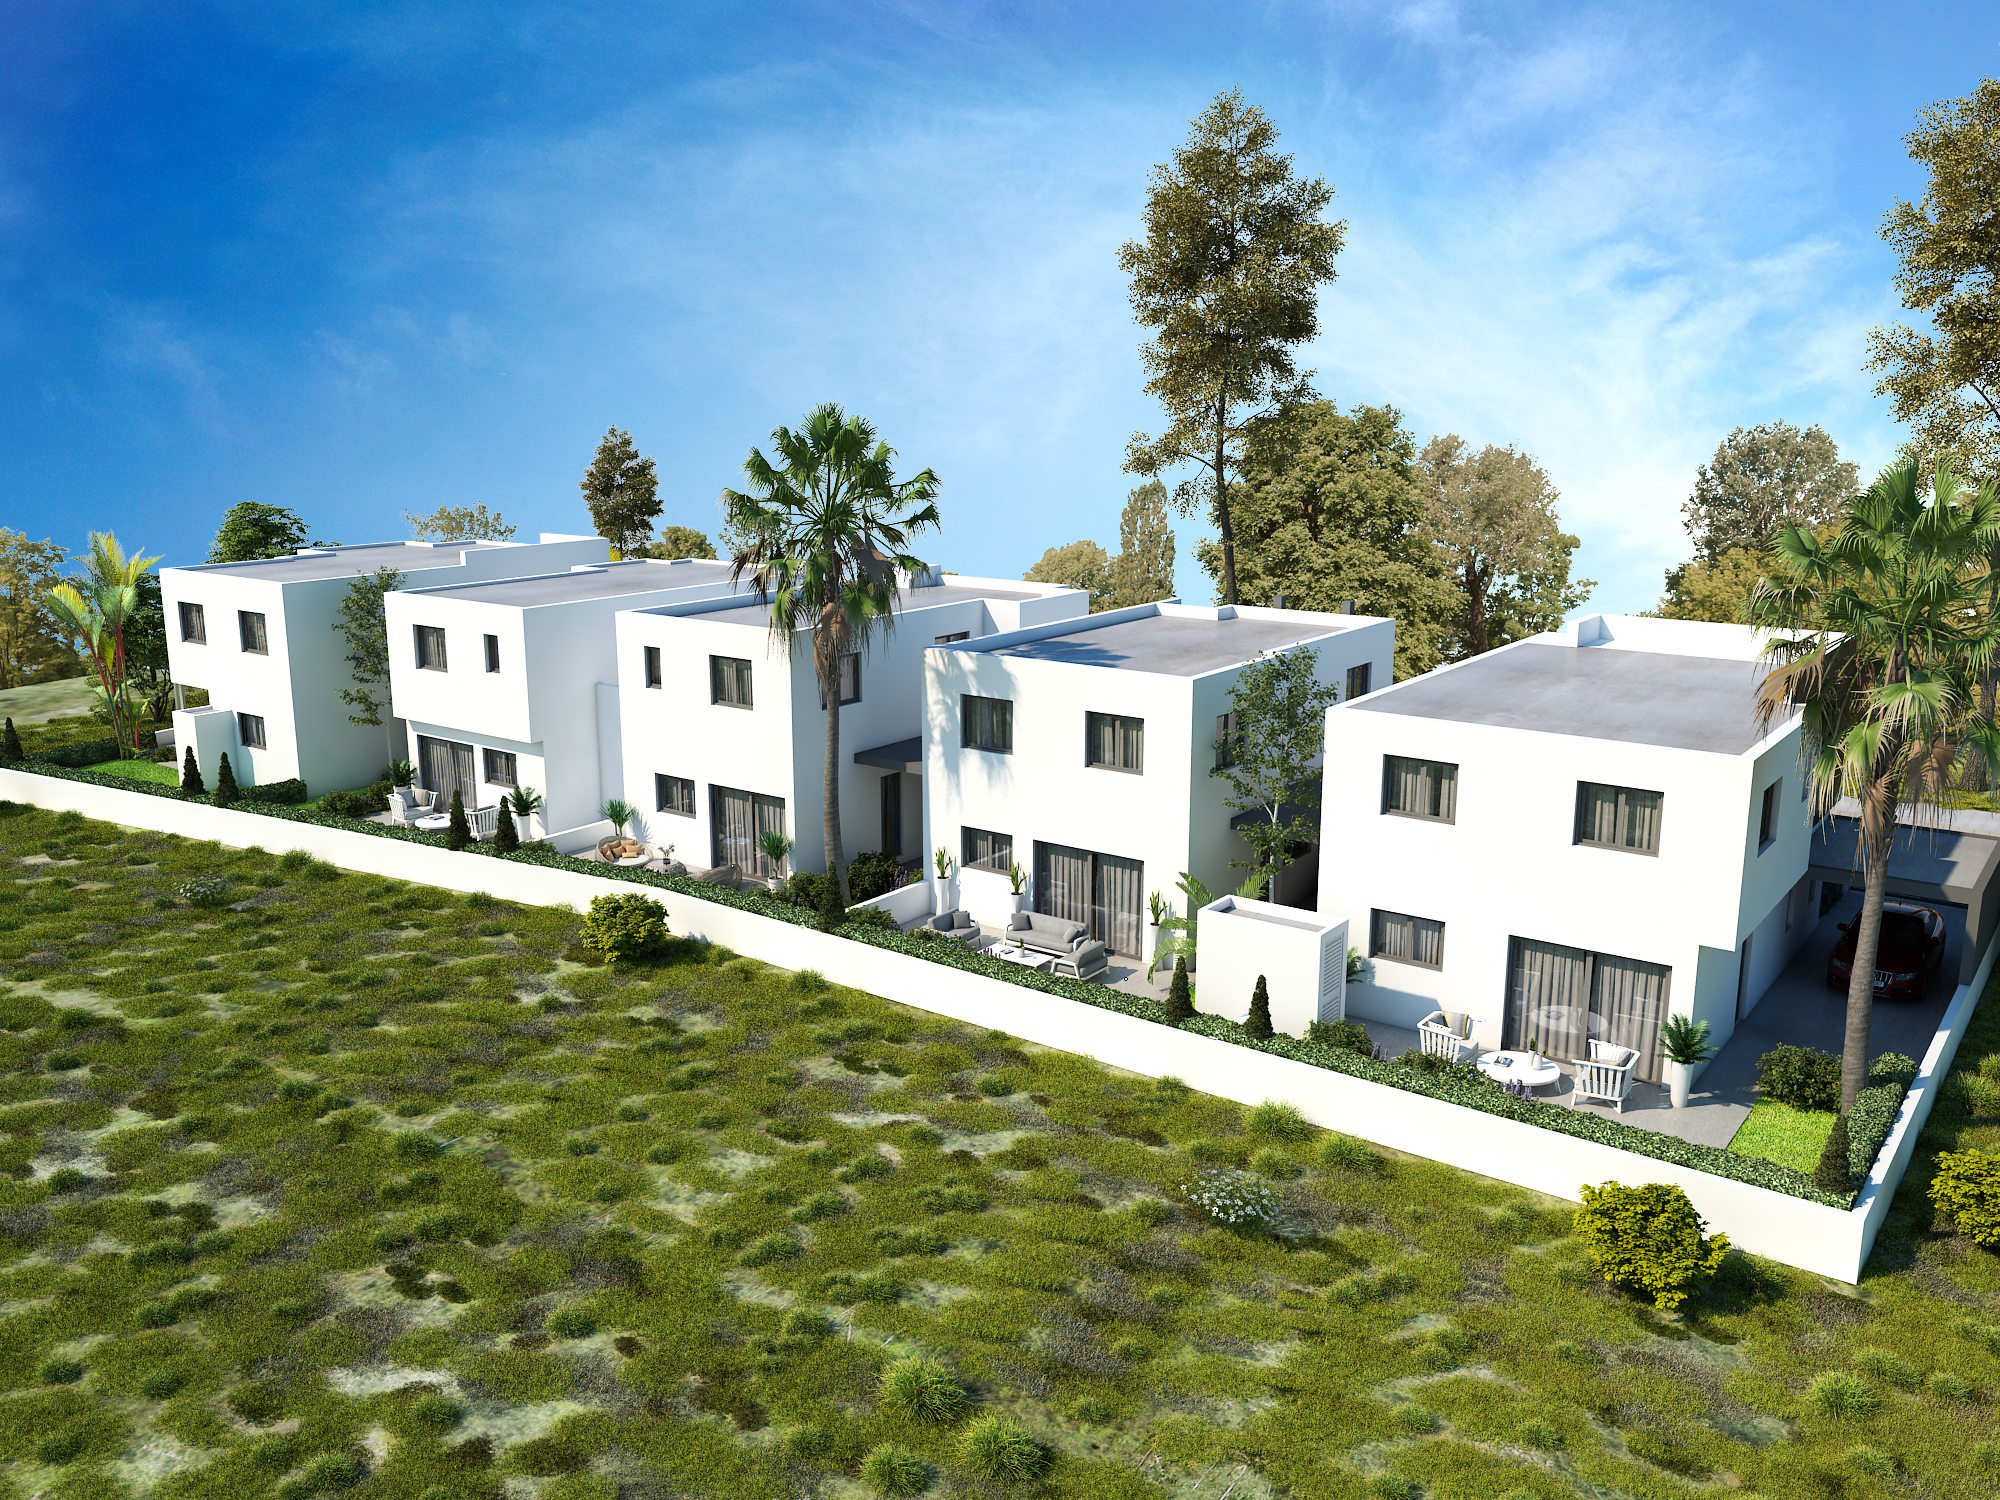 everest-5-houses-final-cam-29- 2